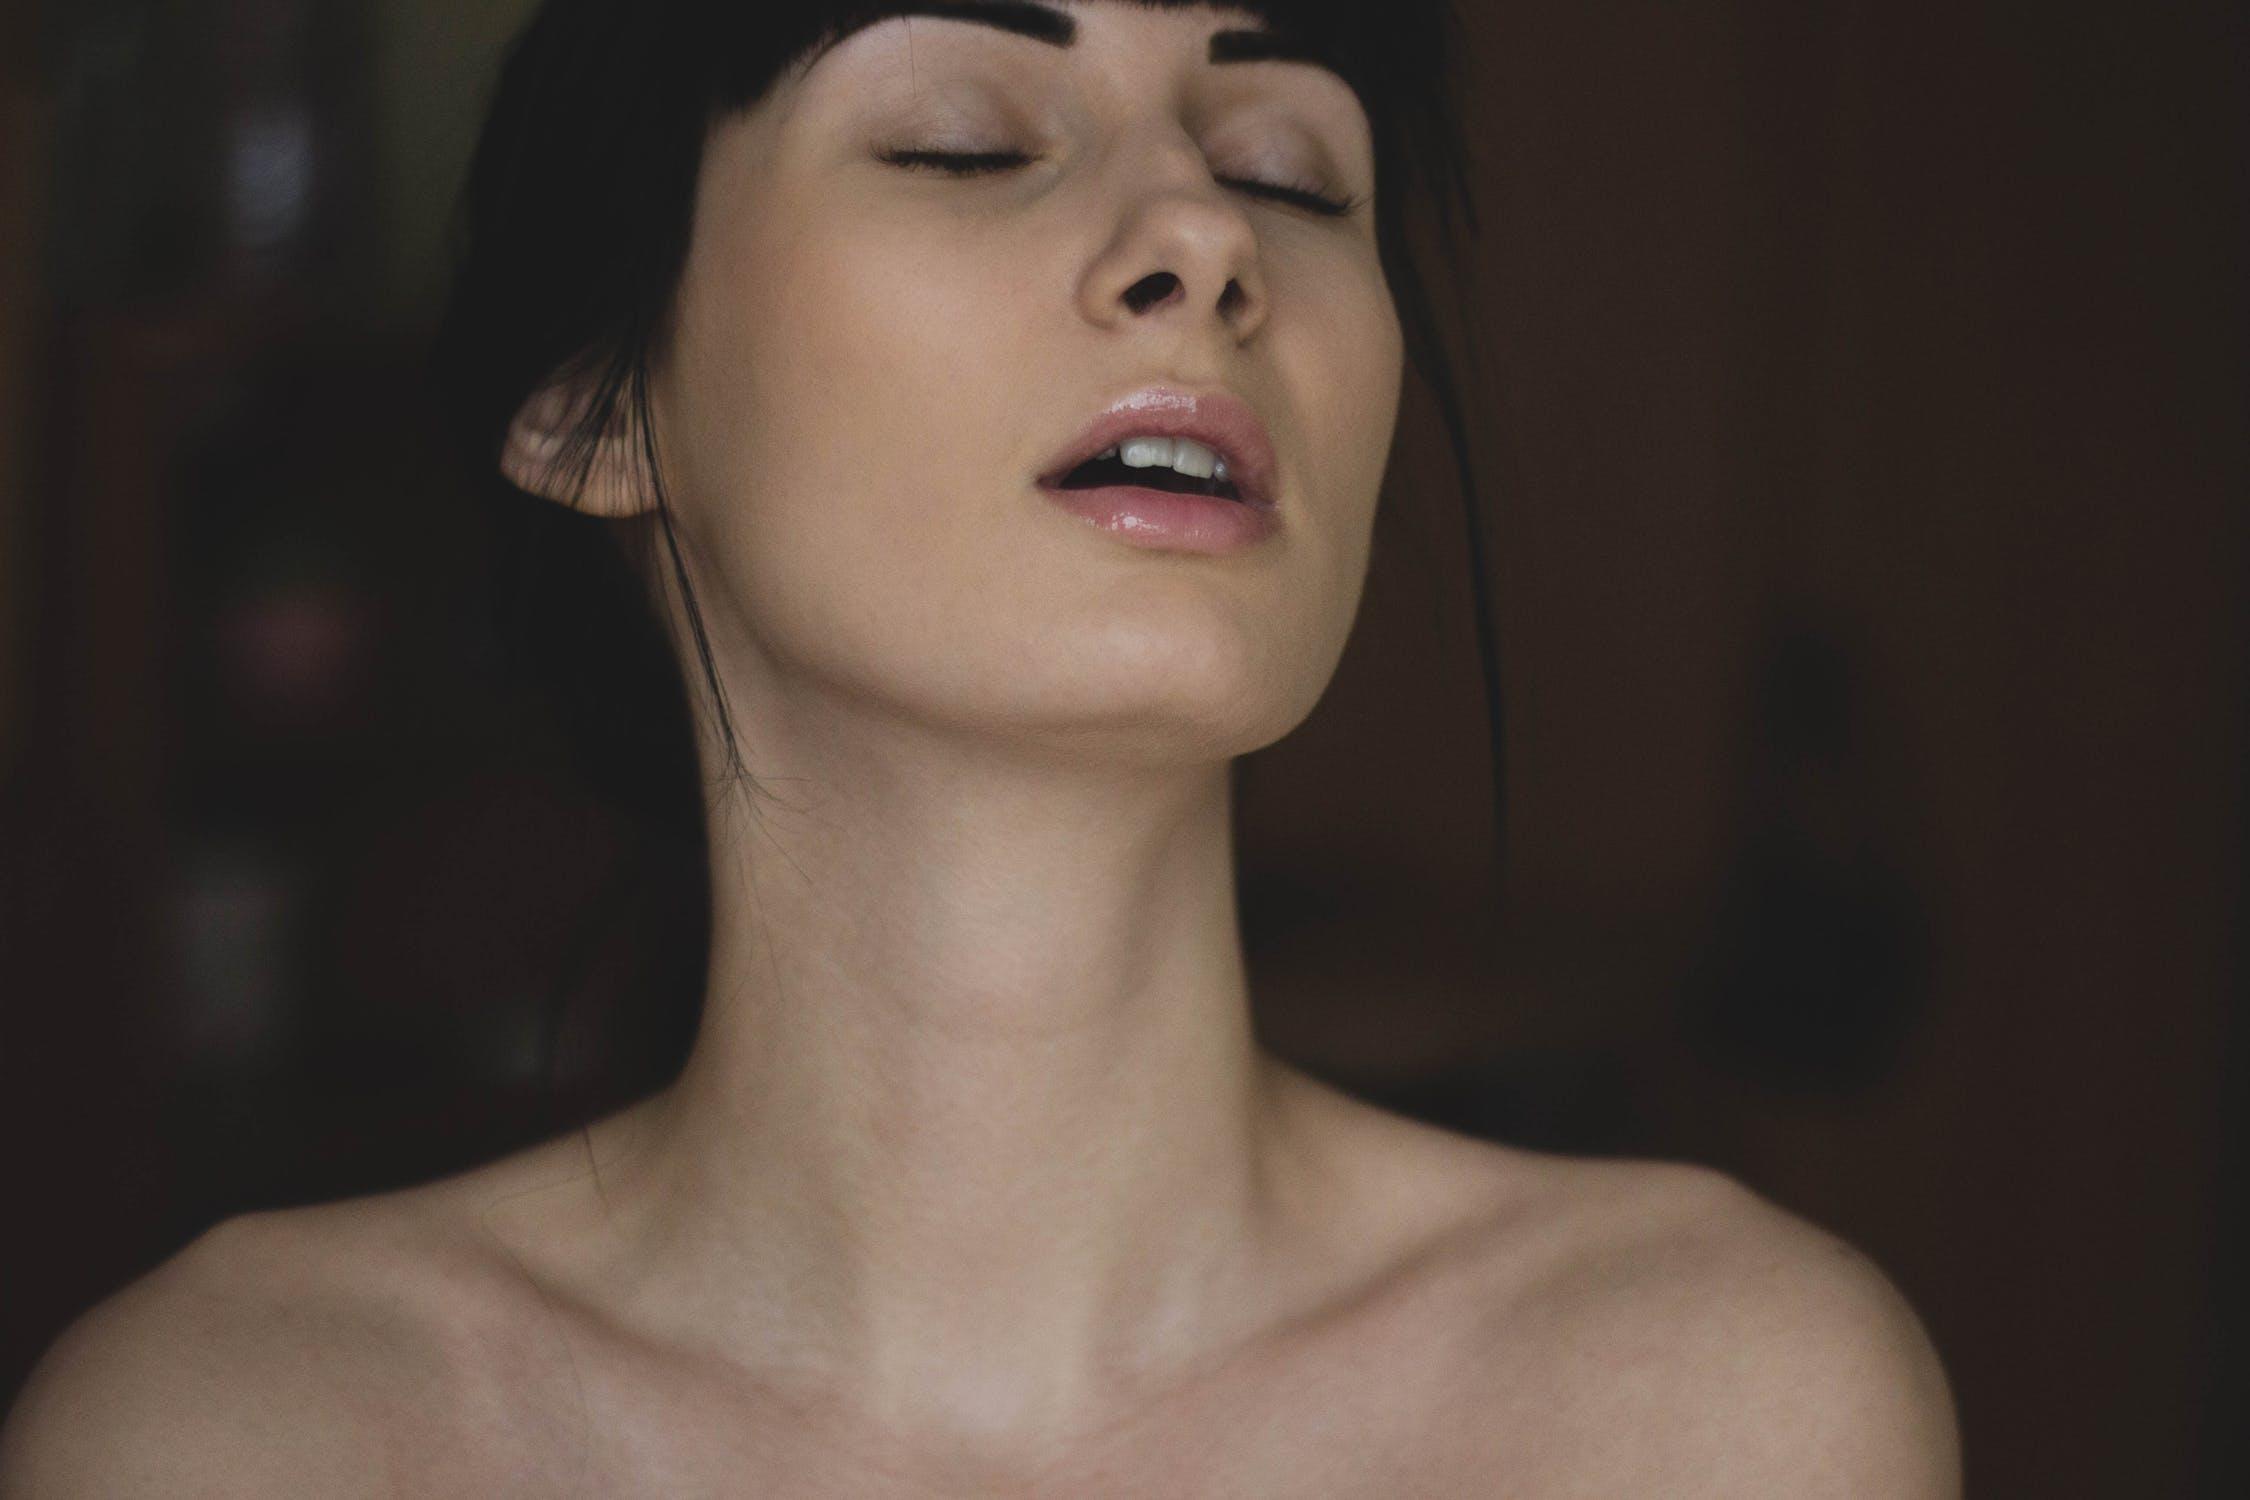 How to Masturbate for Women – 16 Female Masturbation Tips